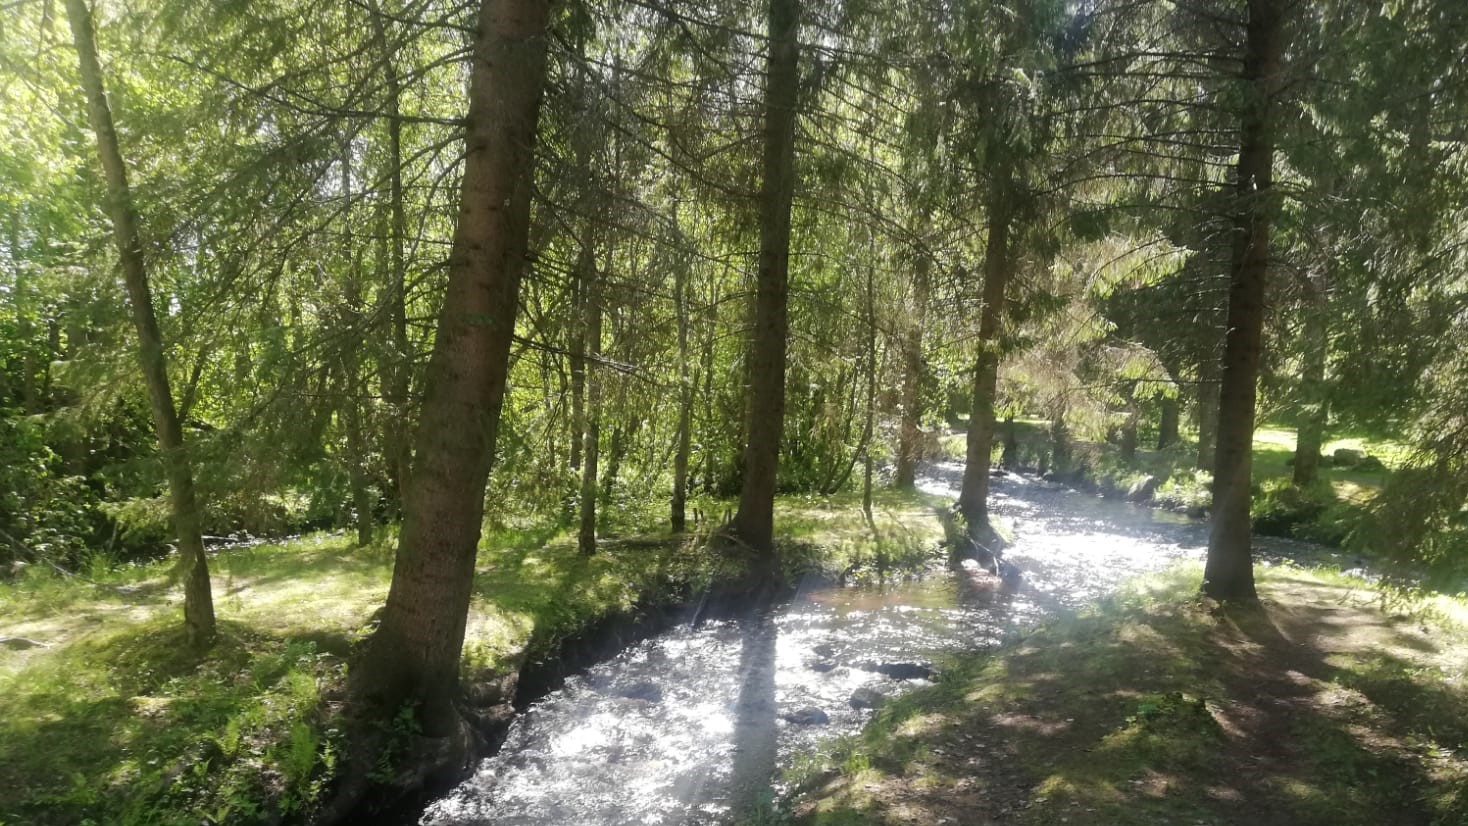 Alakestilä Arboretum in Liminka